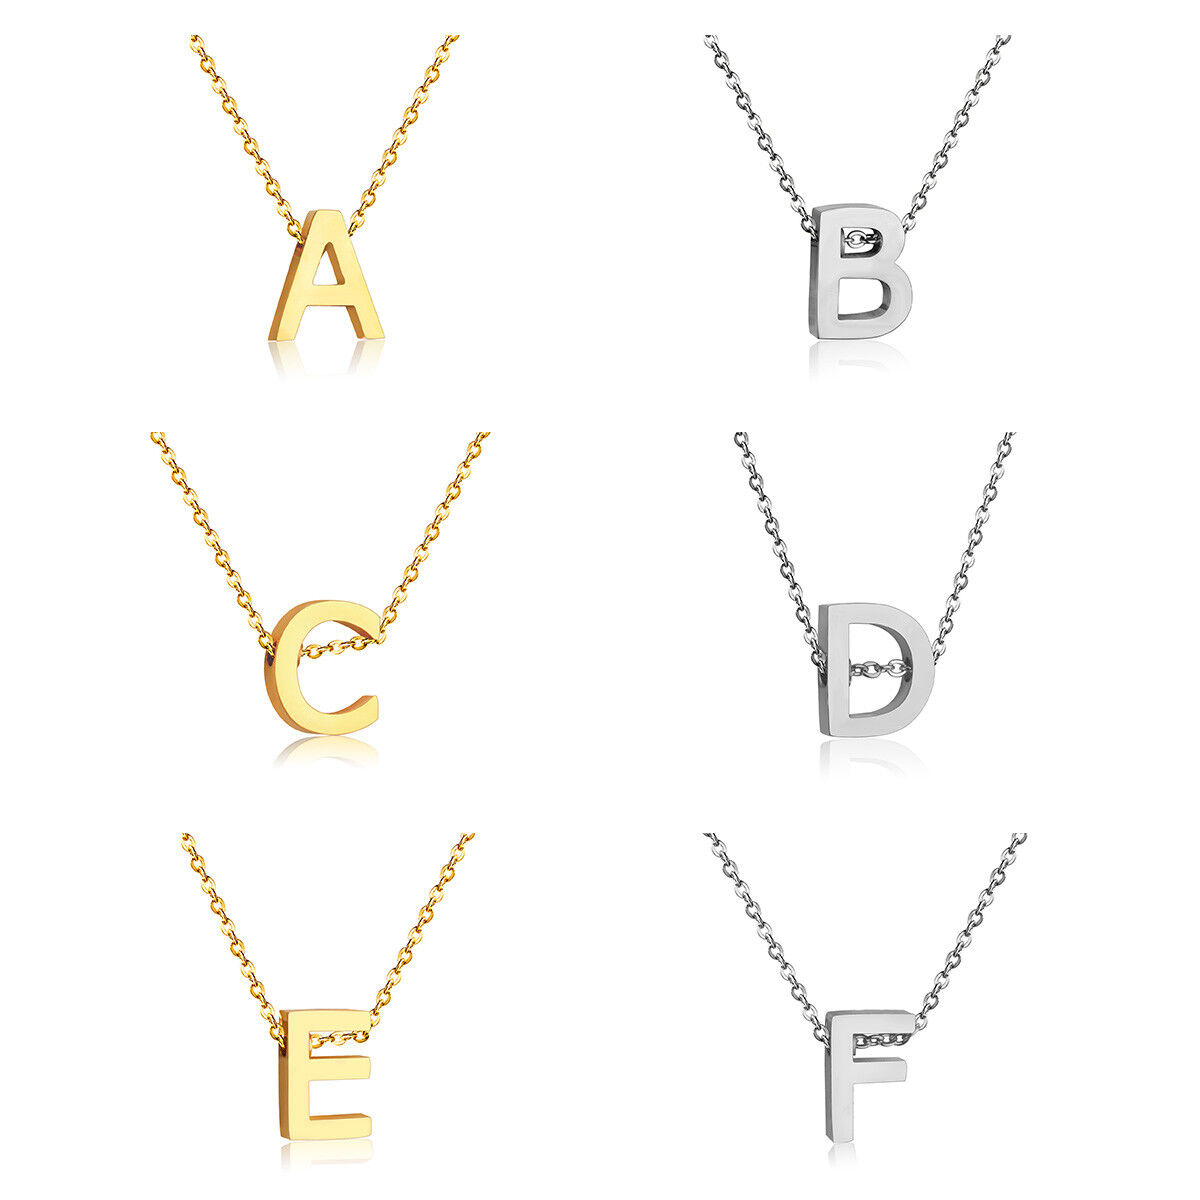 Stainless Steel Women's Unisex 18 Inch Necklace Pendant Lett